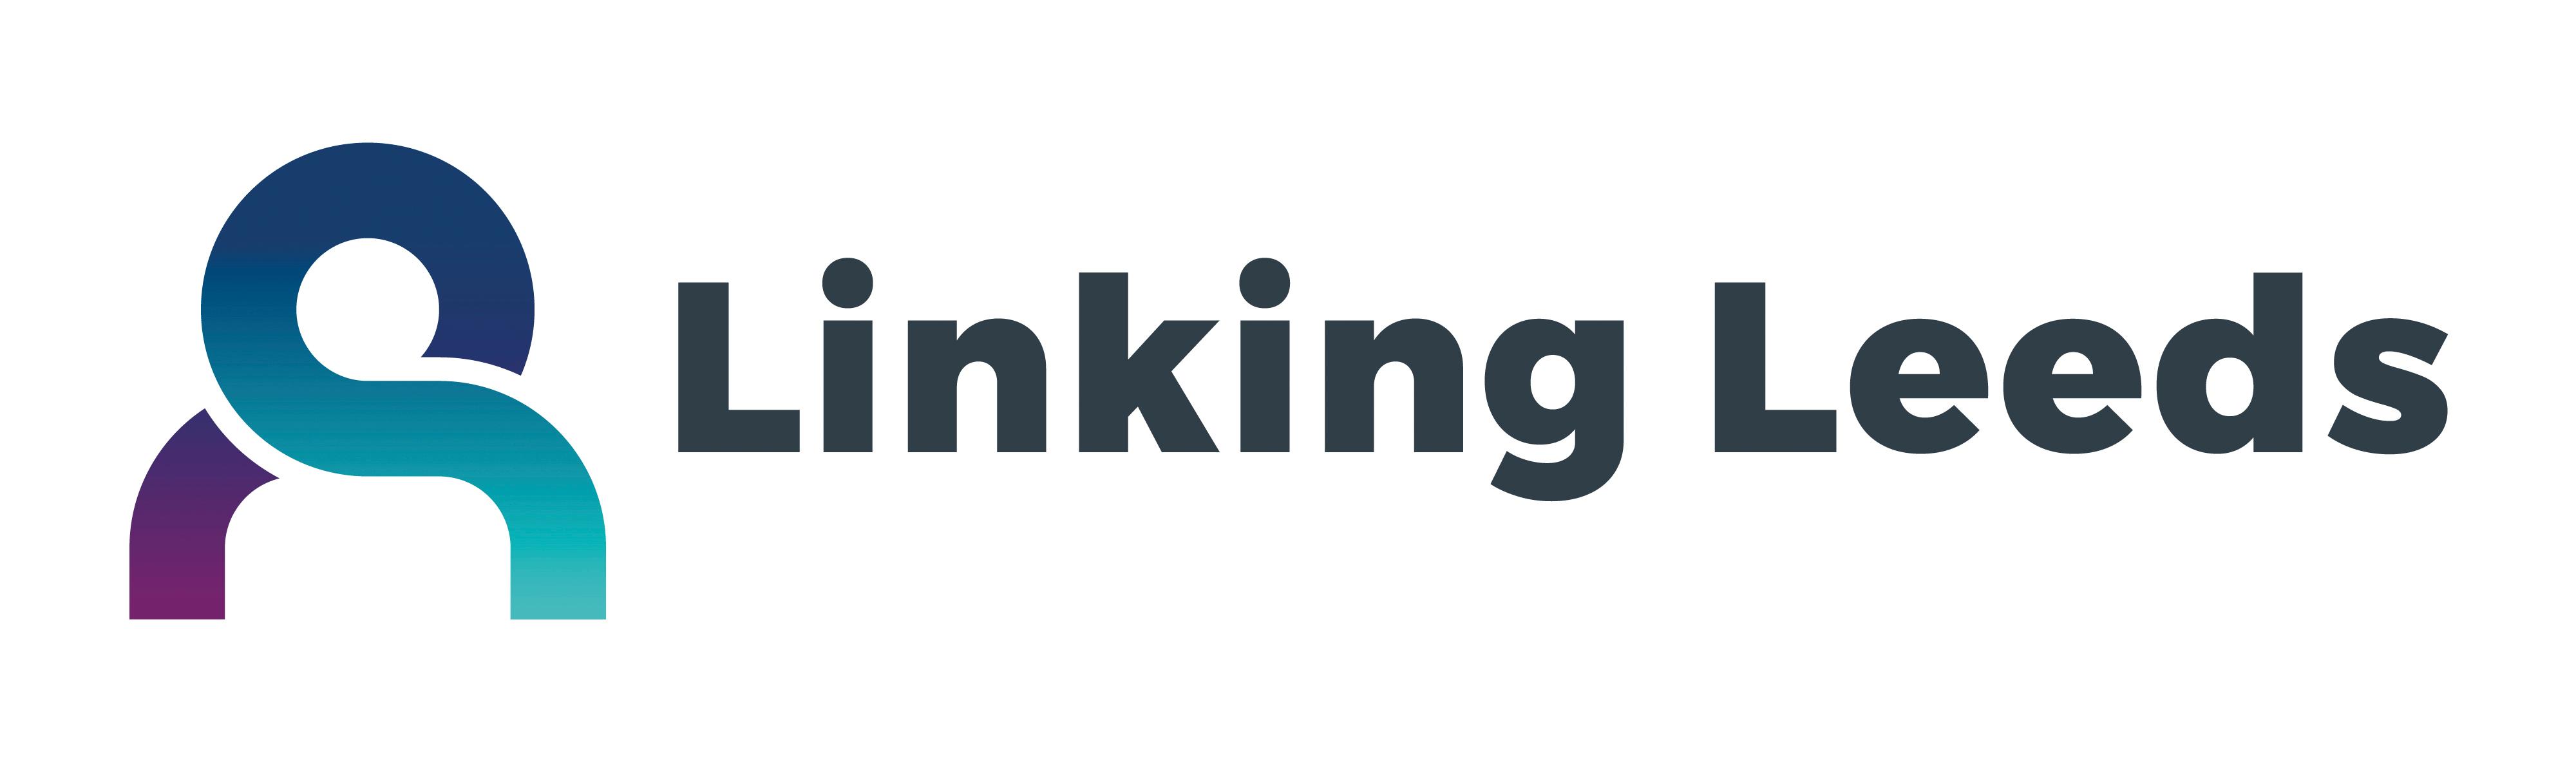 Linking Leeds Logo